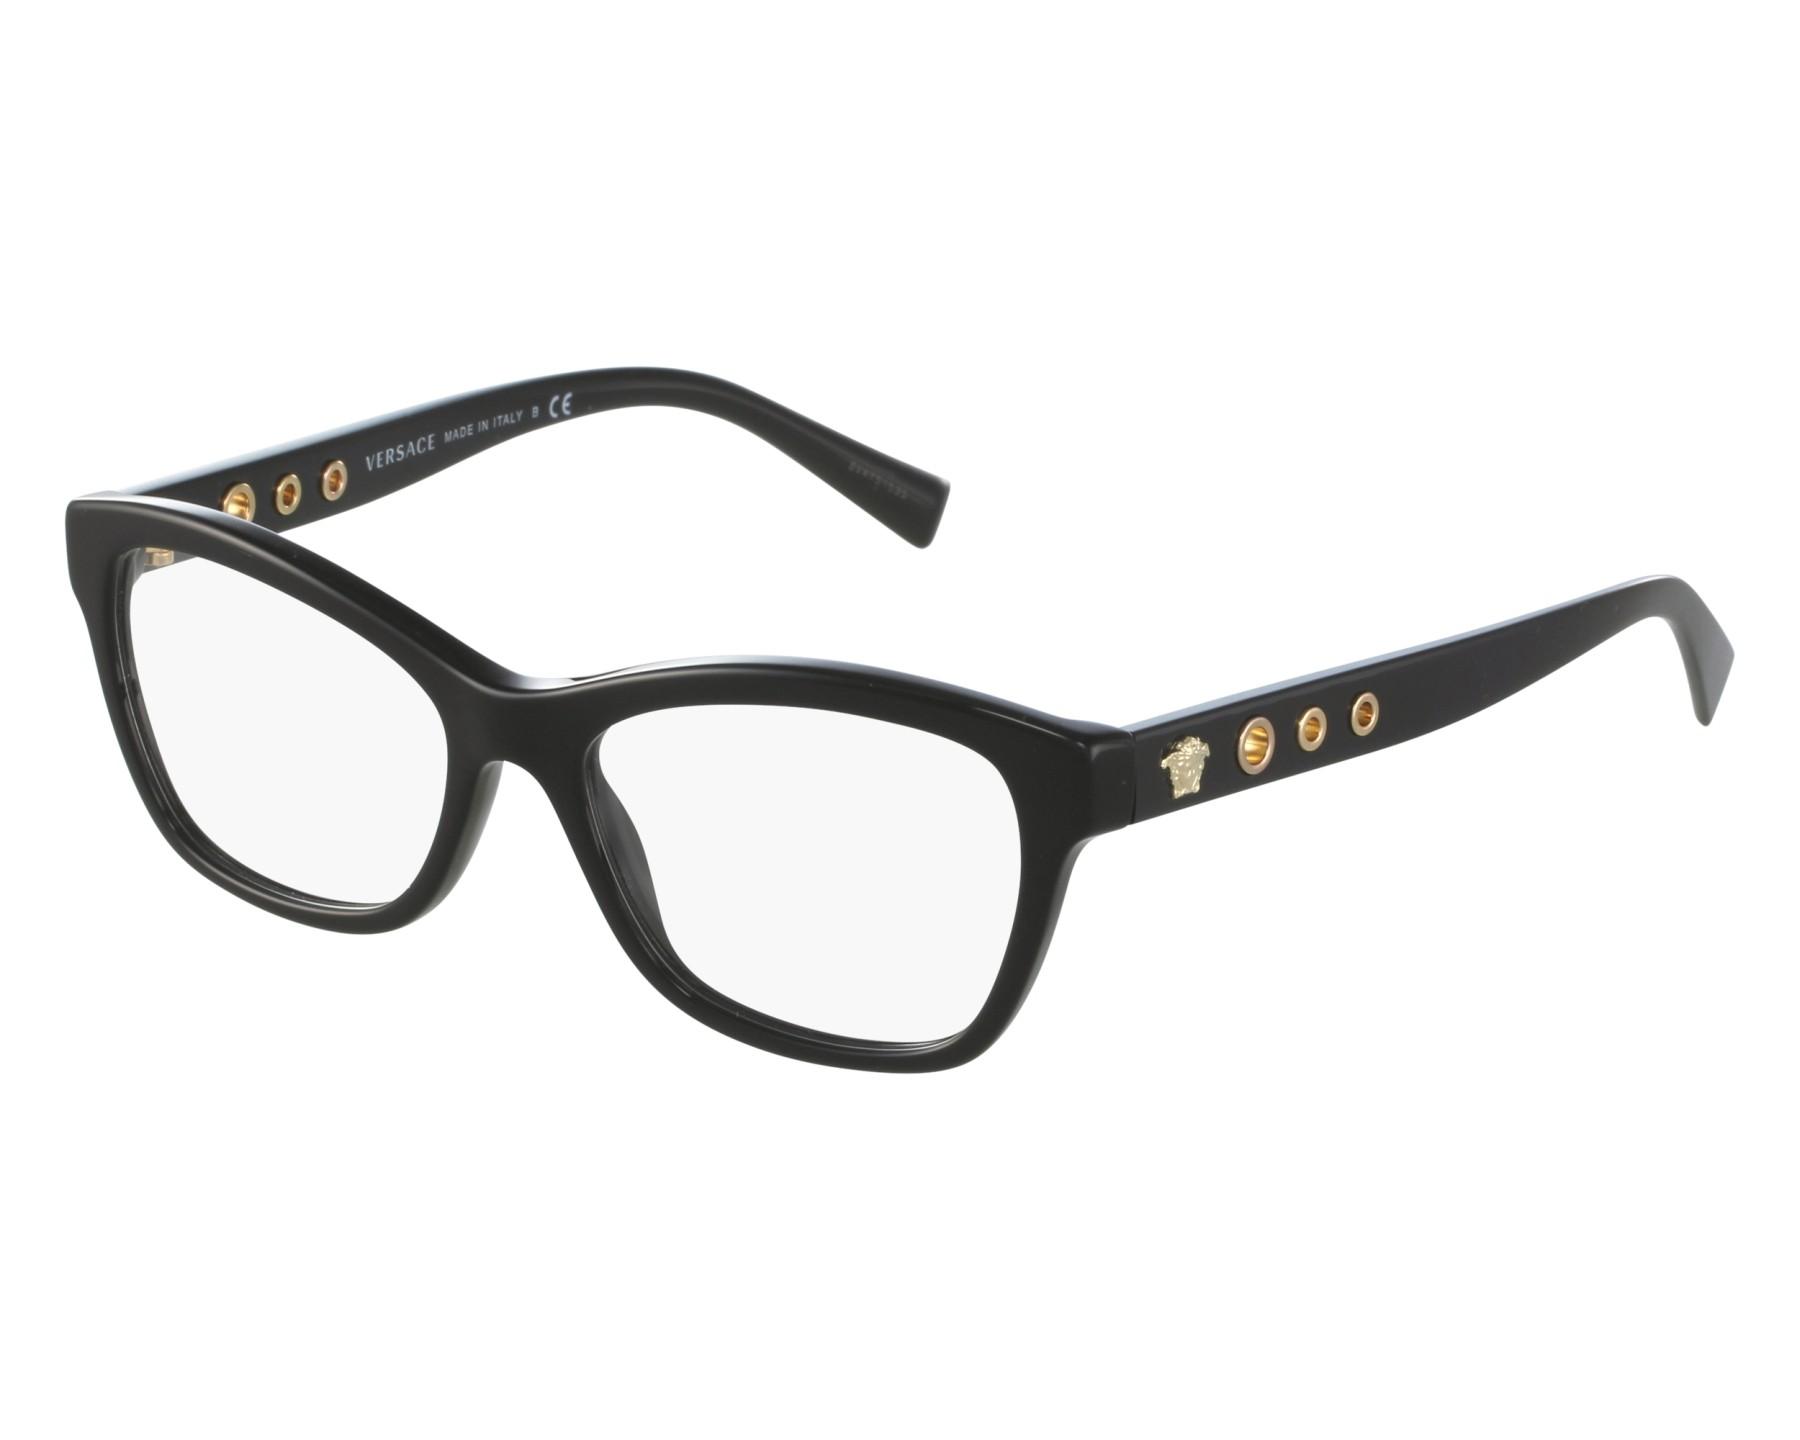 9b83f6bbad8 eyeglasses Versace VE-3225 GB1 - Black front view